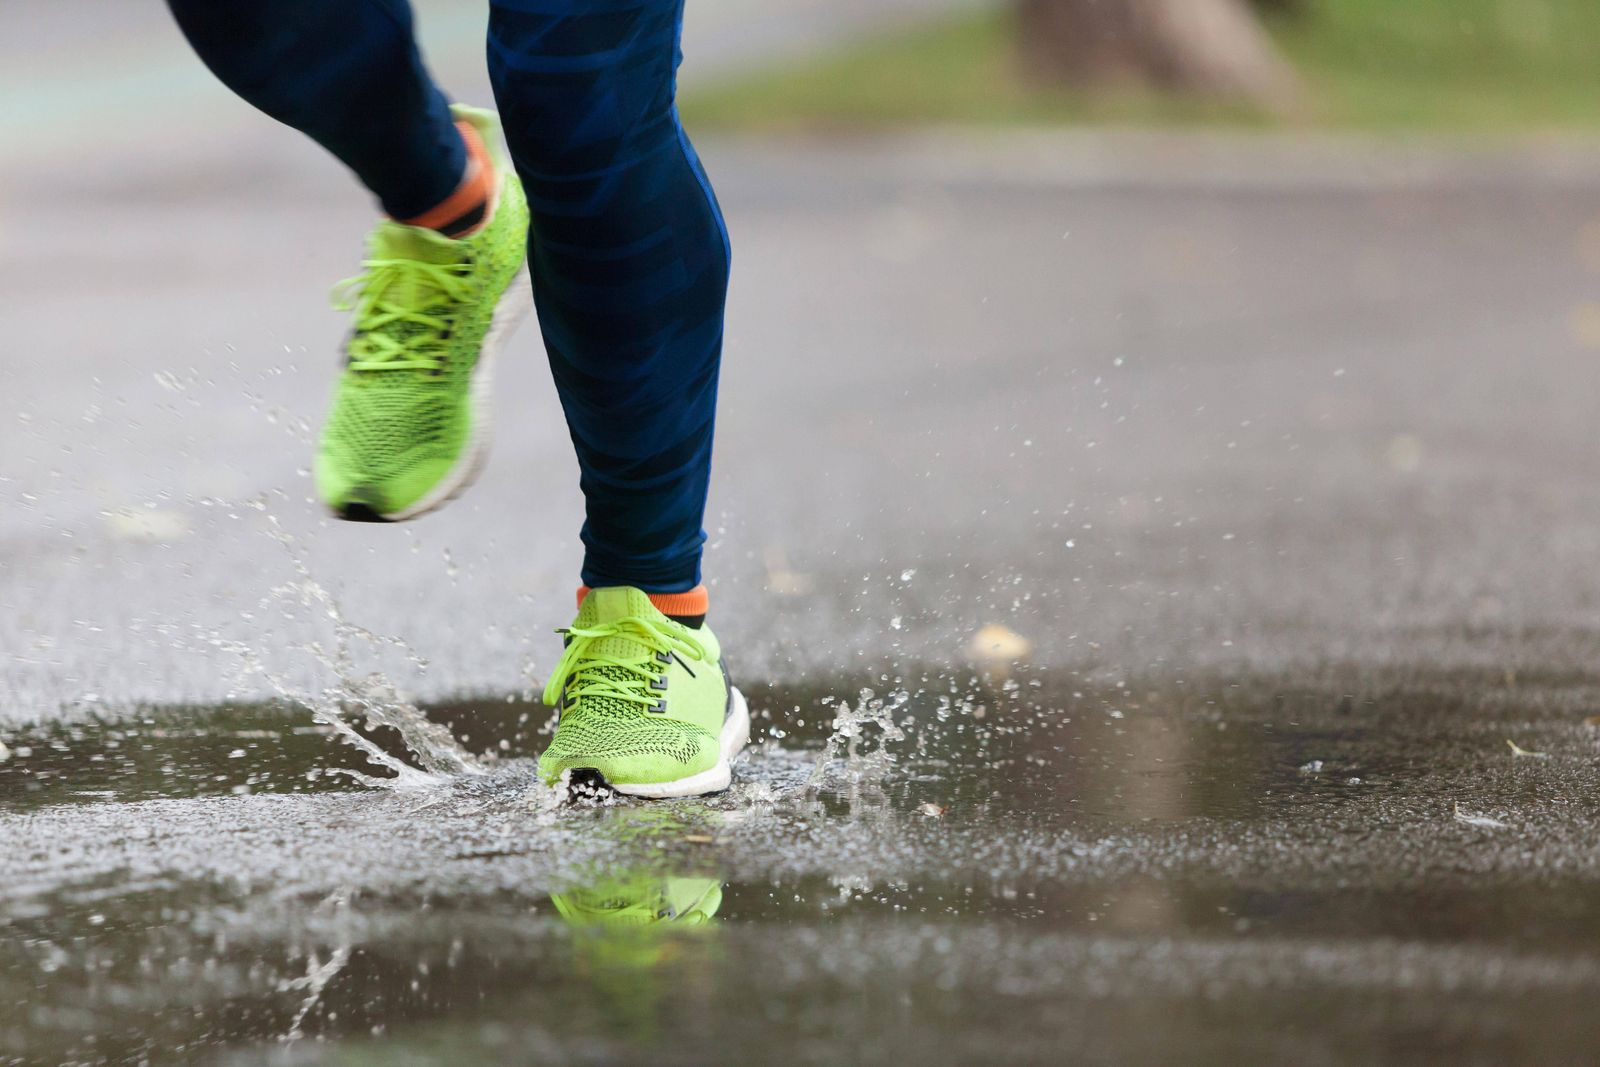 Jogging in the park model released Symbolfoto PUBLICATIONxINxGERxSUIxAUTxONLY Copyright xblanarux